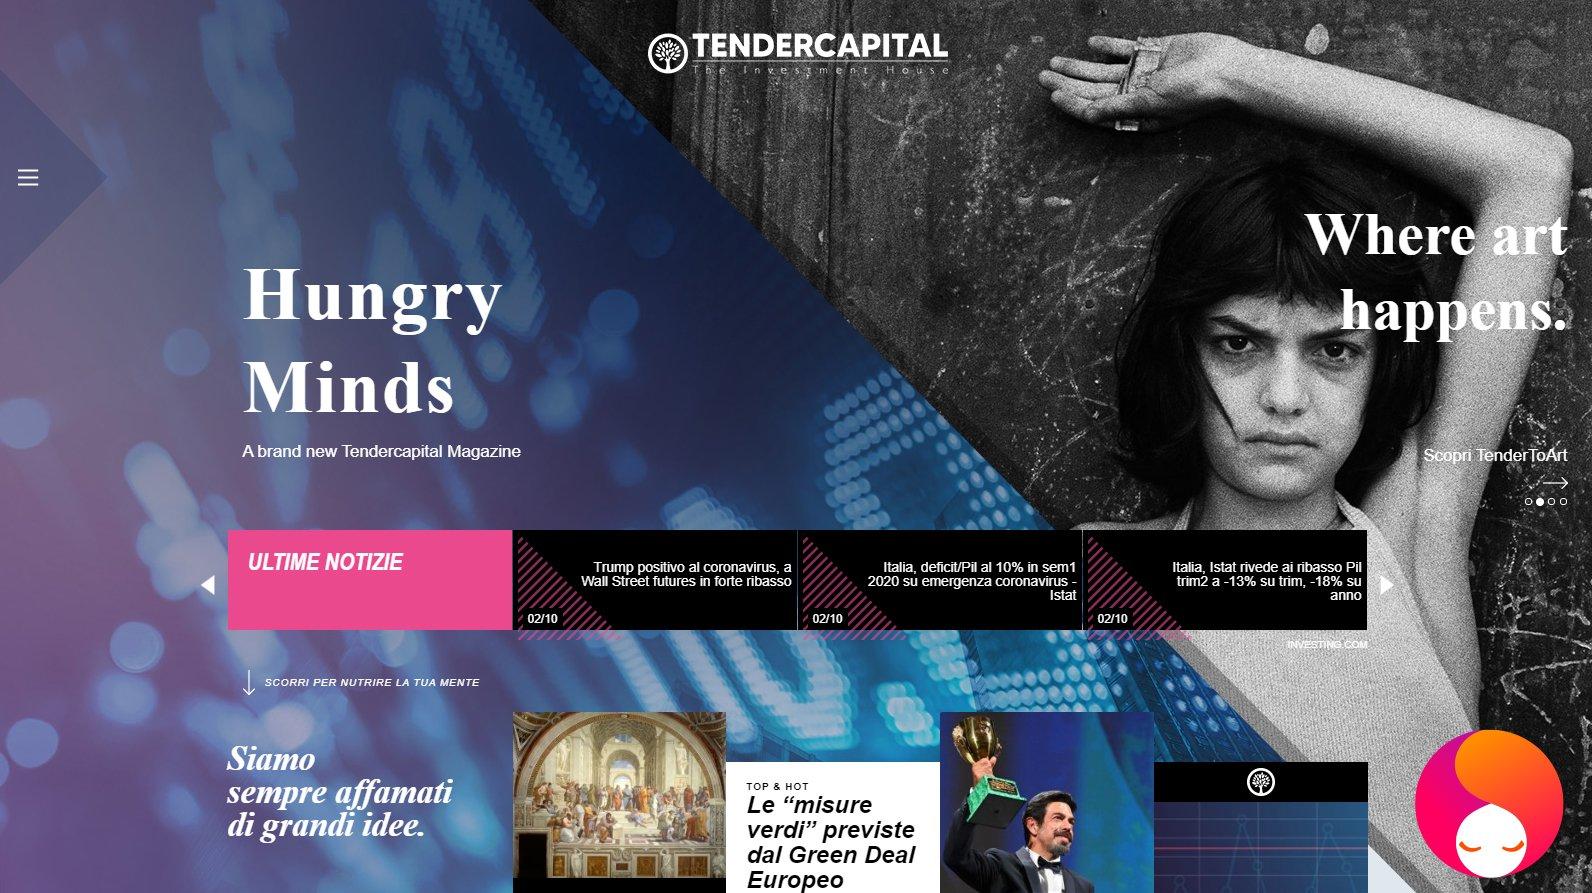 AIDA: Sito Web di Tender Capital